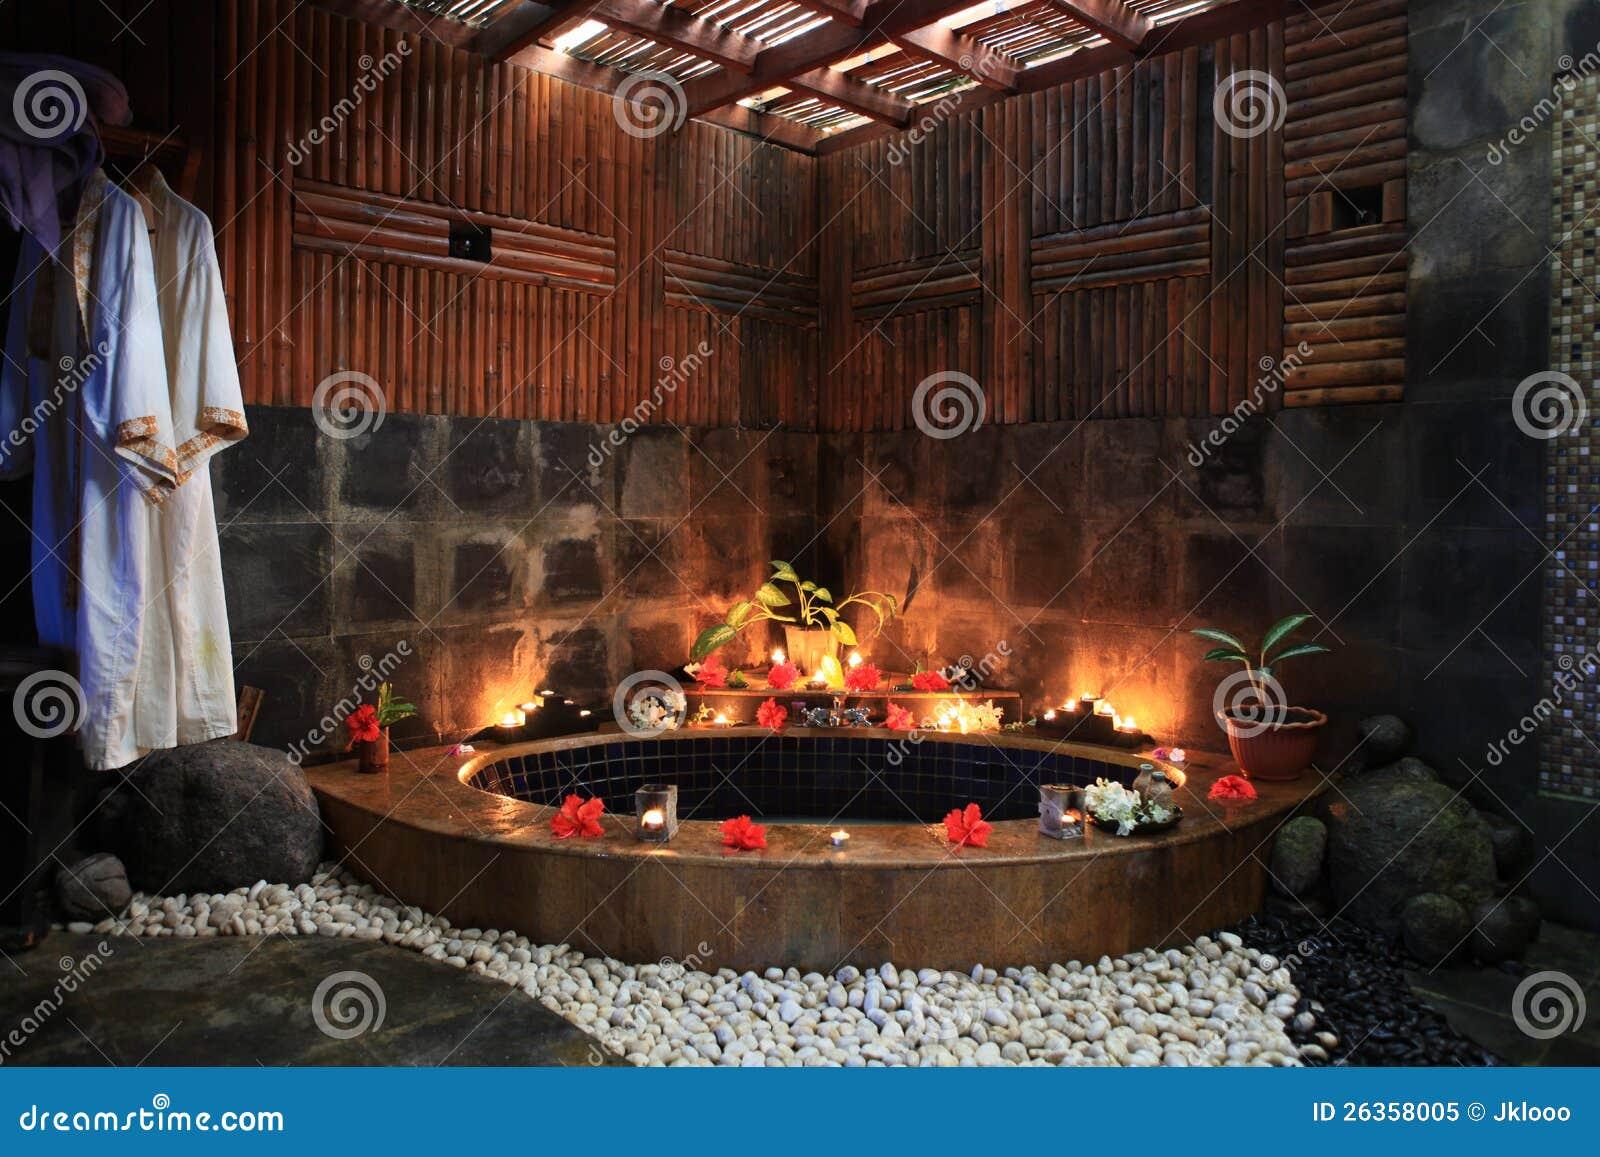 Tropical style bathroom royalty free stock photo image 26358005 - Salle de bain tropicale ...